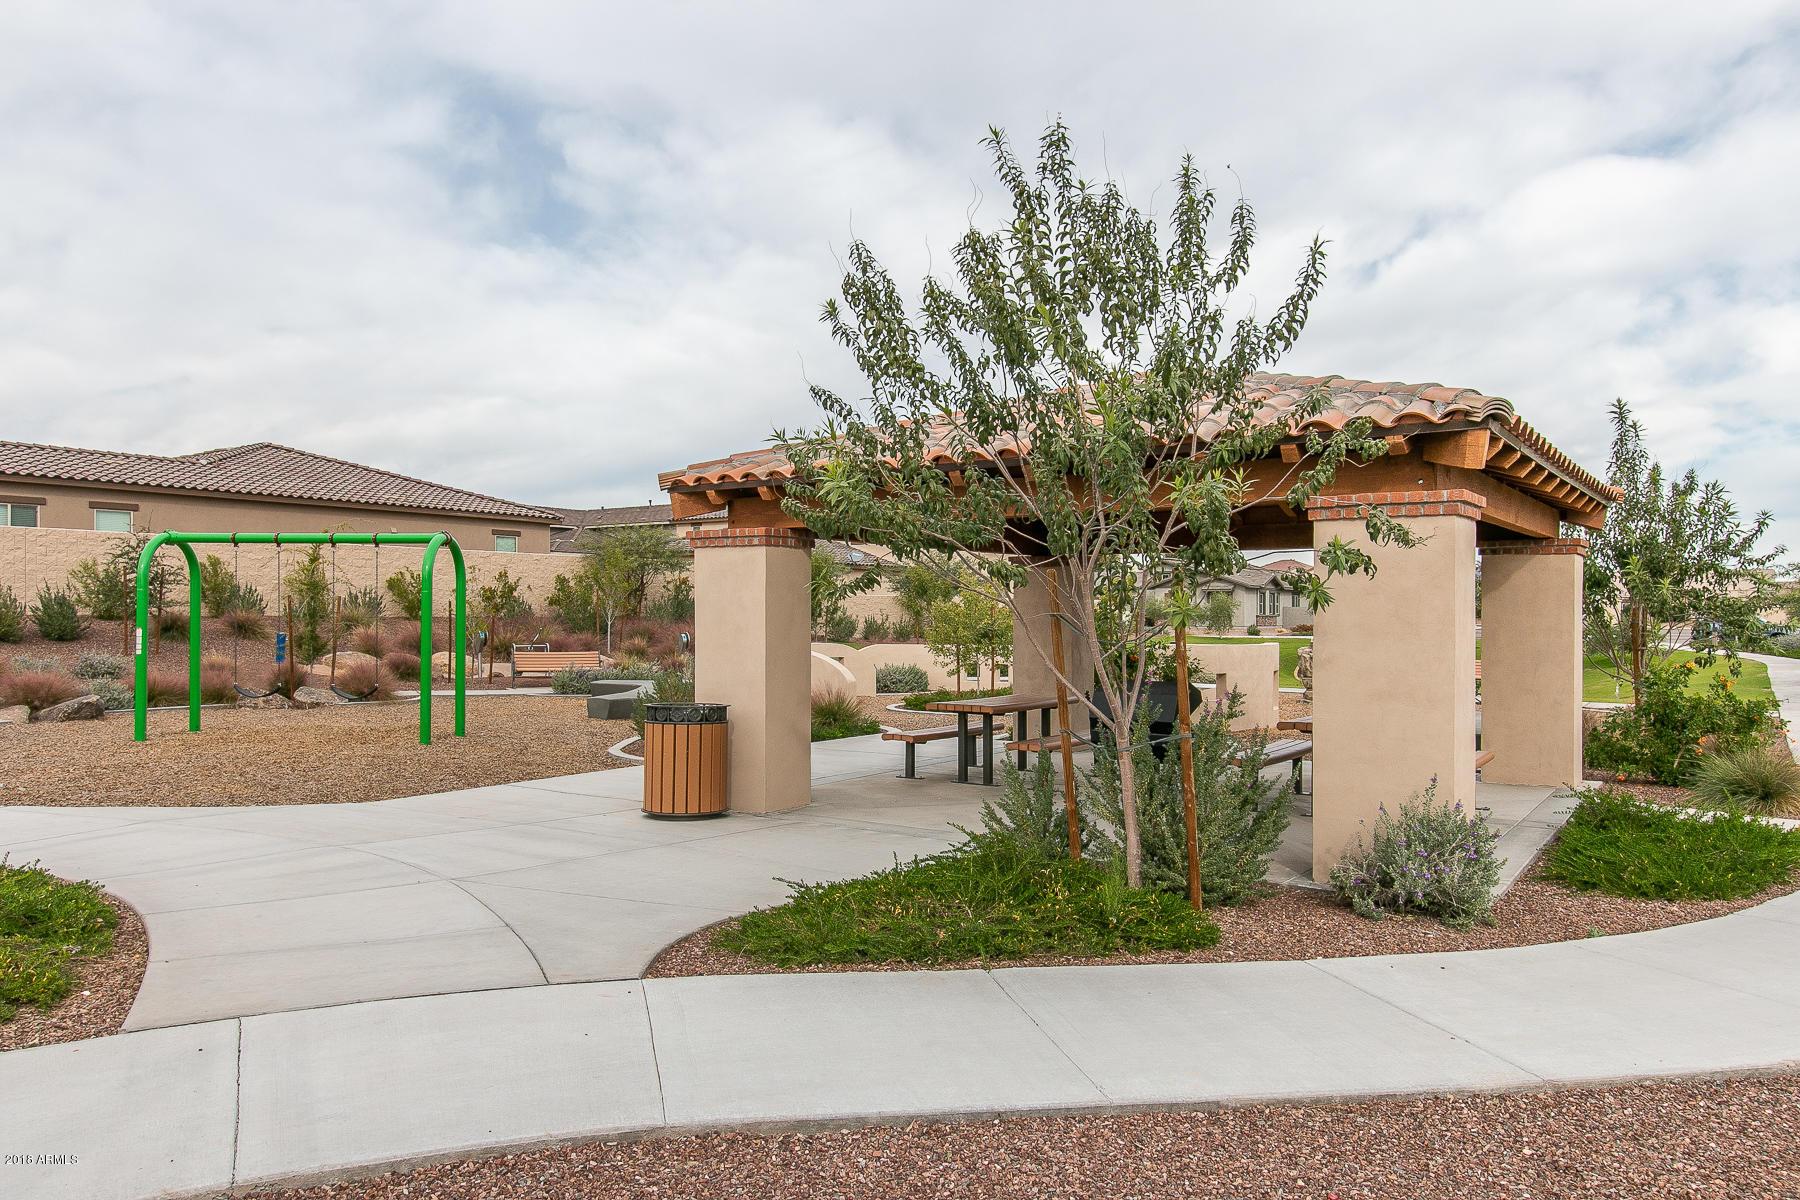 MLS 5847472 13764 W SARANO Terrace, Litchfield Park, AZ 85340 Litchfield Park AZ Newly Built